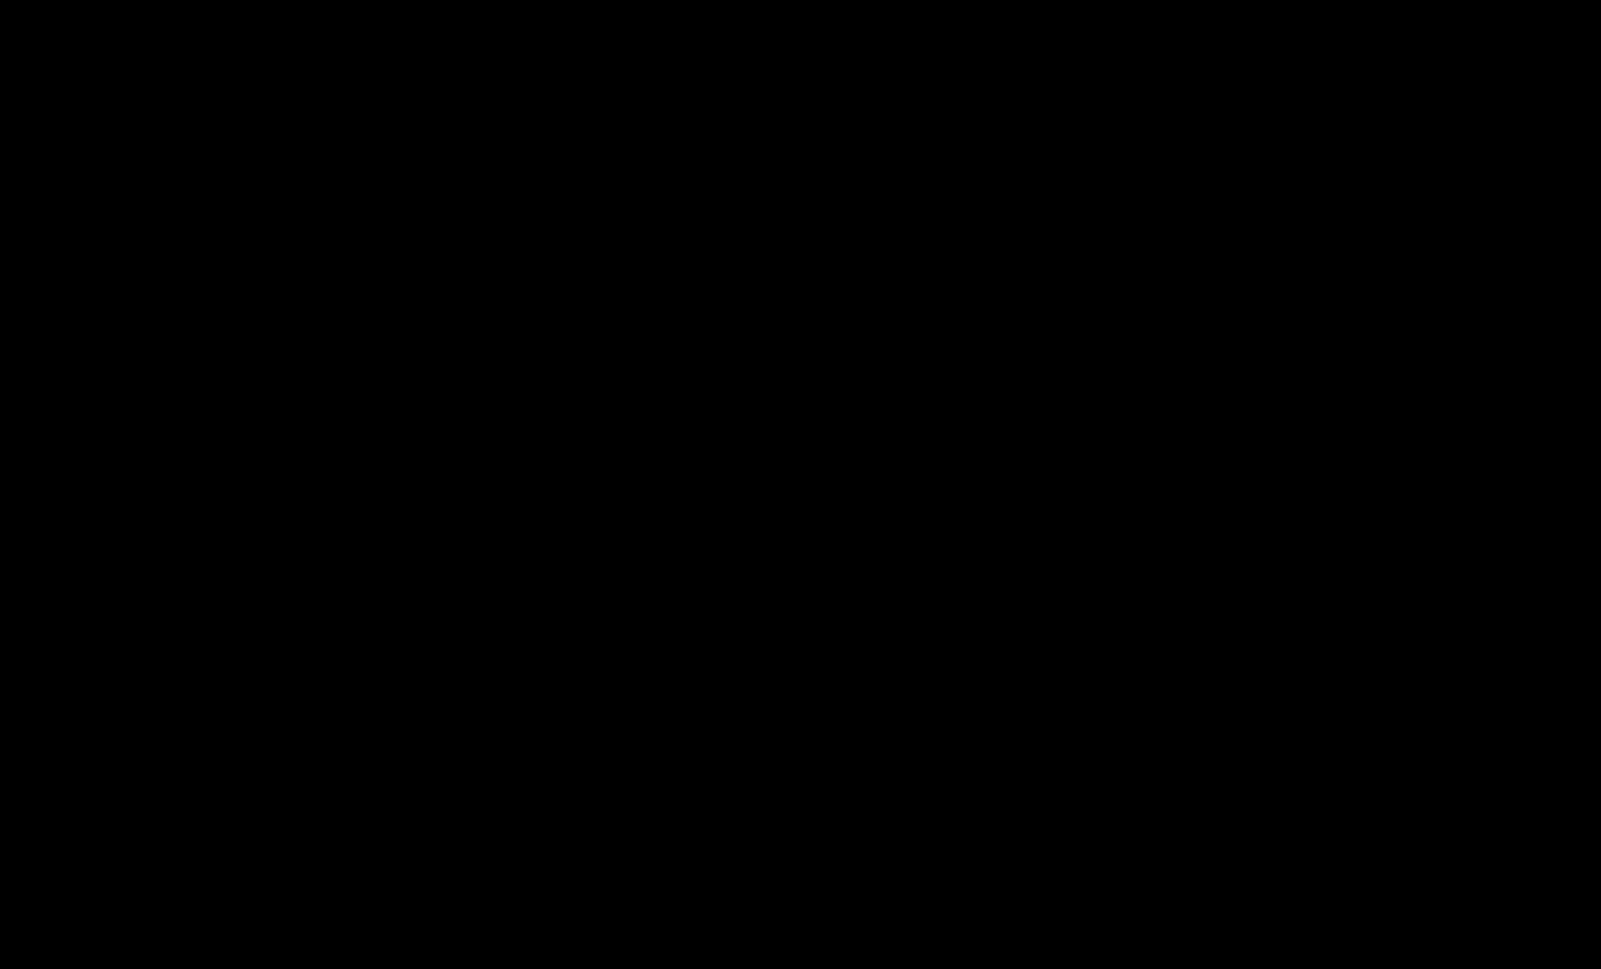 Biotin-dPEG®₃-MAL